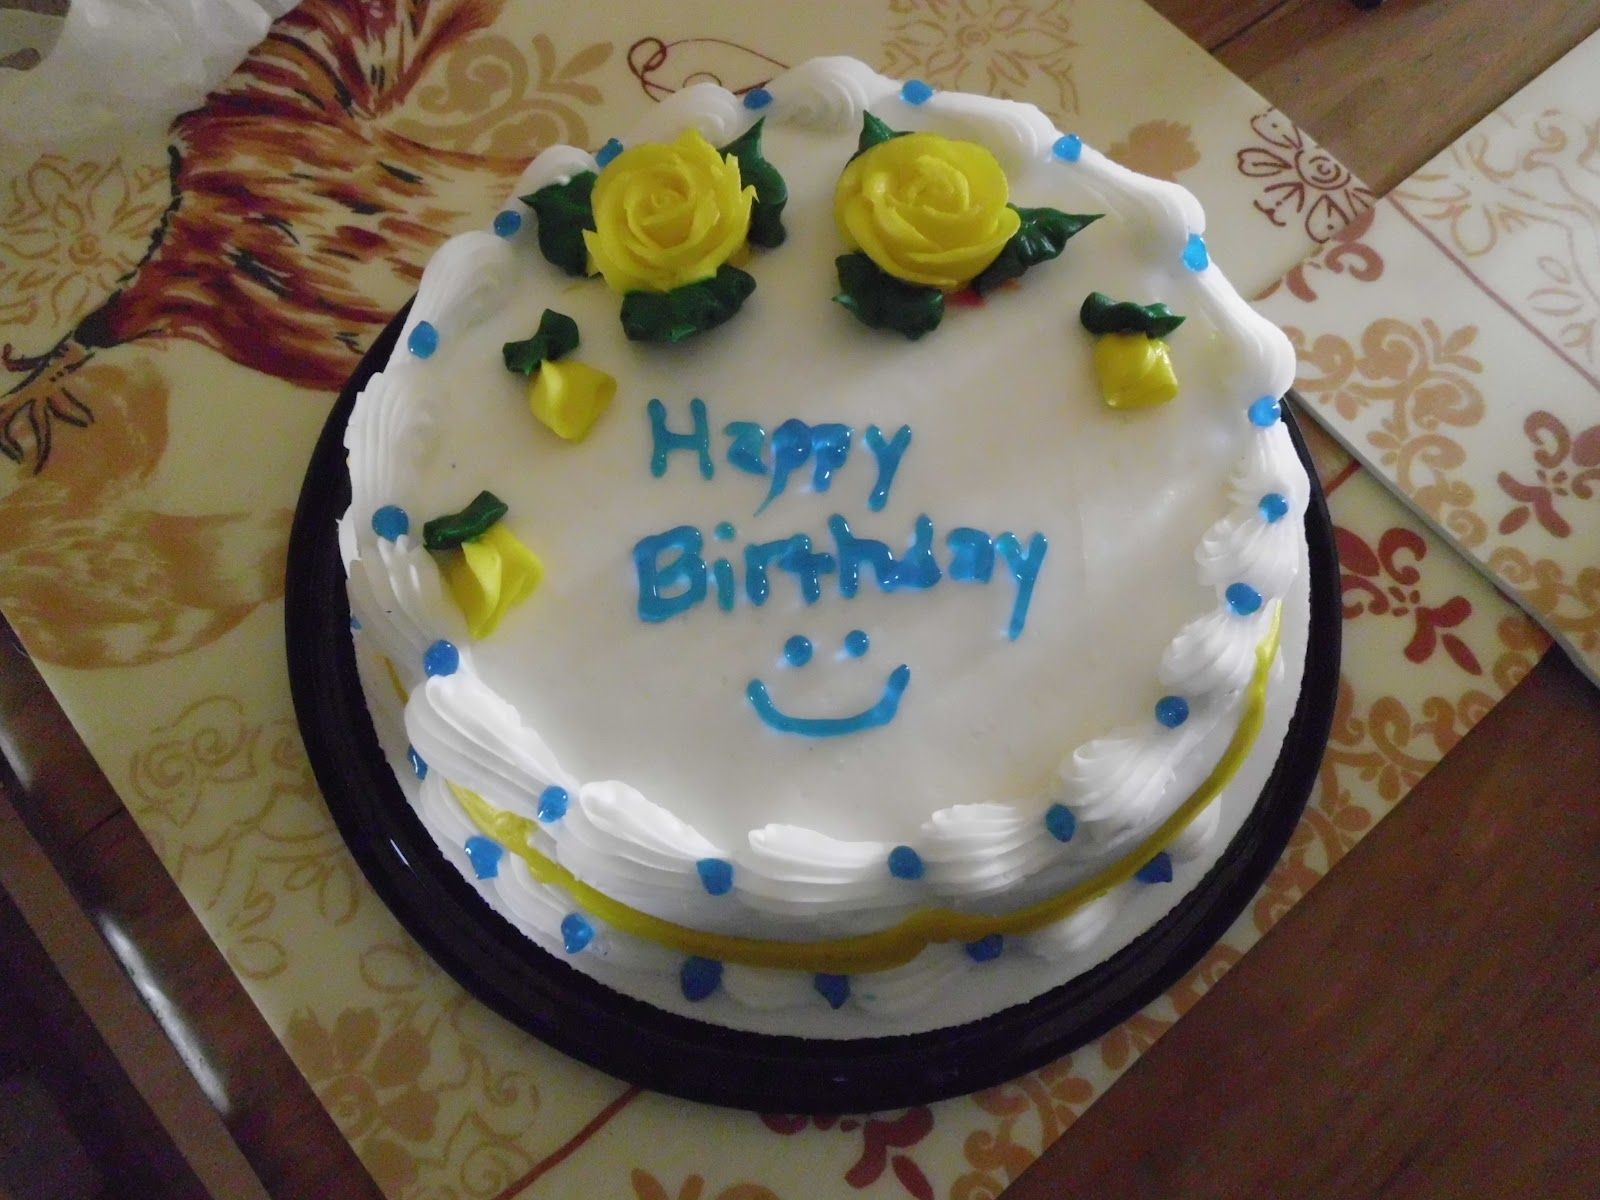 Celebration Birhtday Image Happy birthday cake pictures